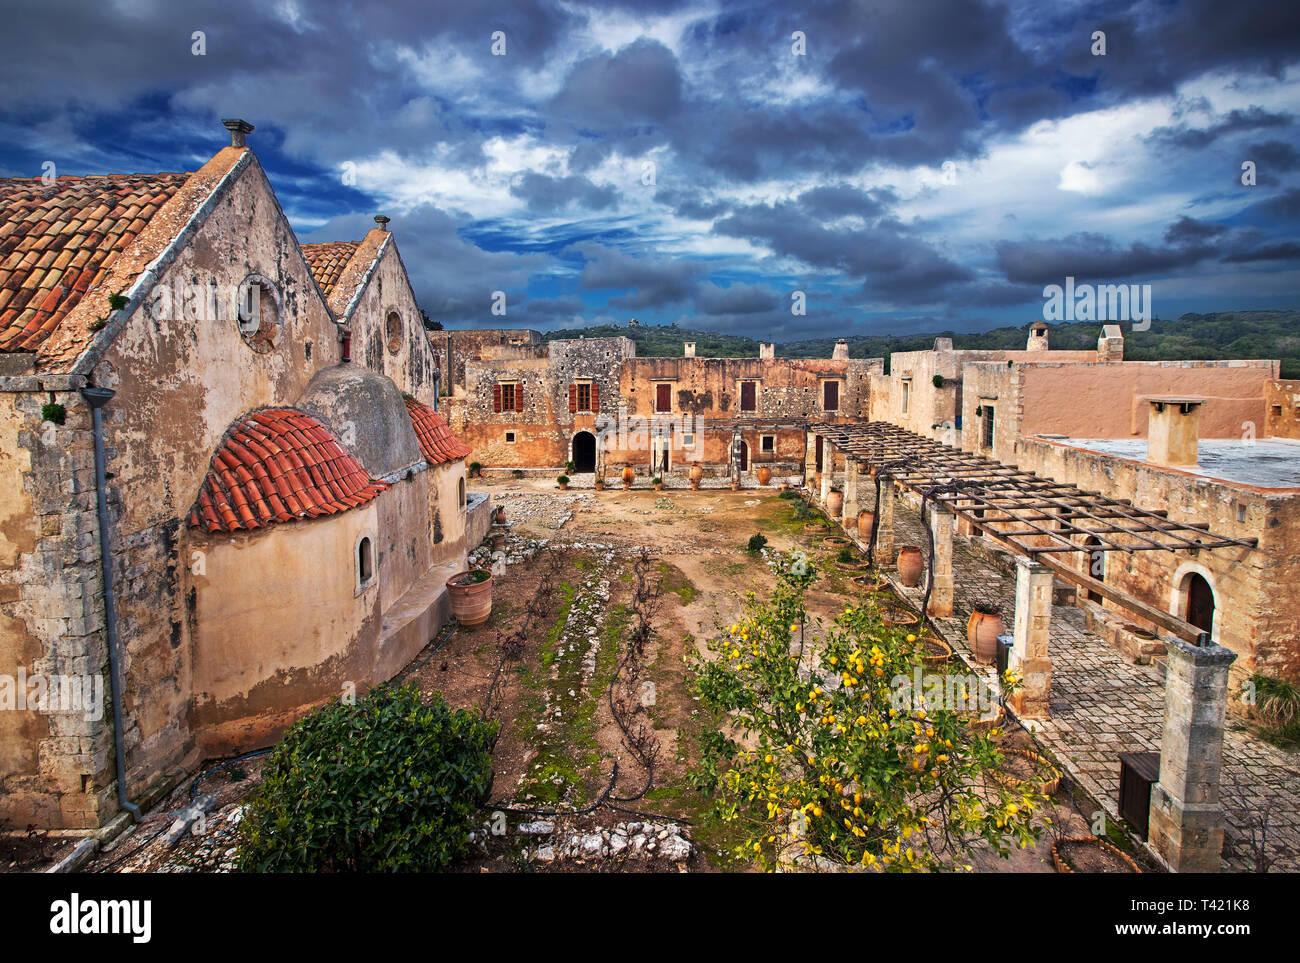 The main church of Arkadi Monastery, symbol of the struggle of Cretans against the Ottoman Empire  , Rethymno, Crete, Greece. - Stock Image